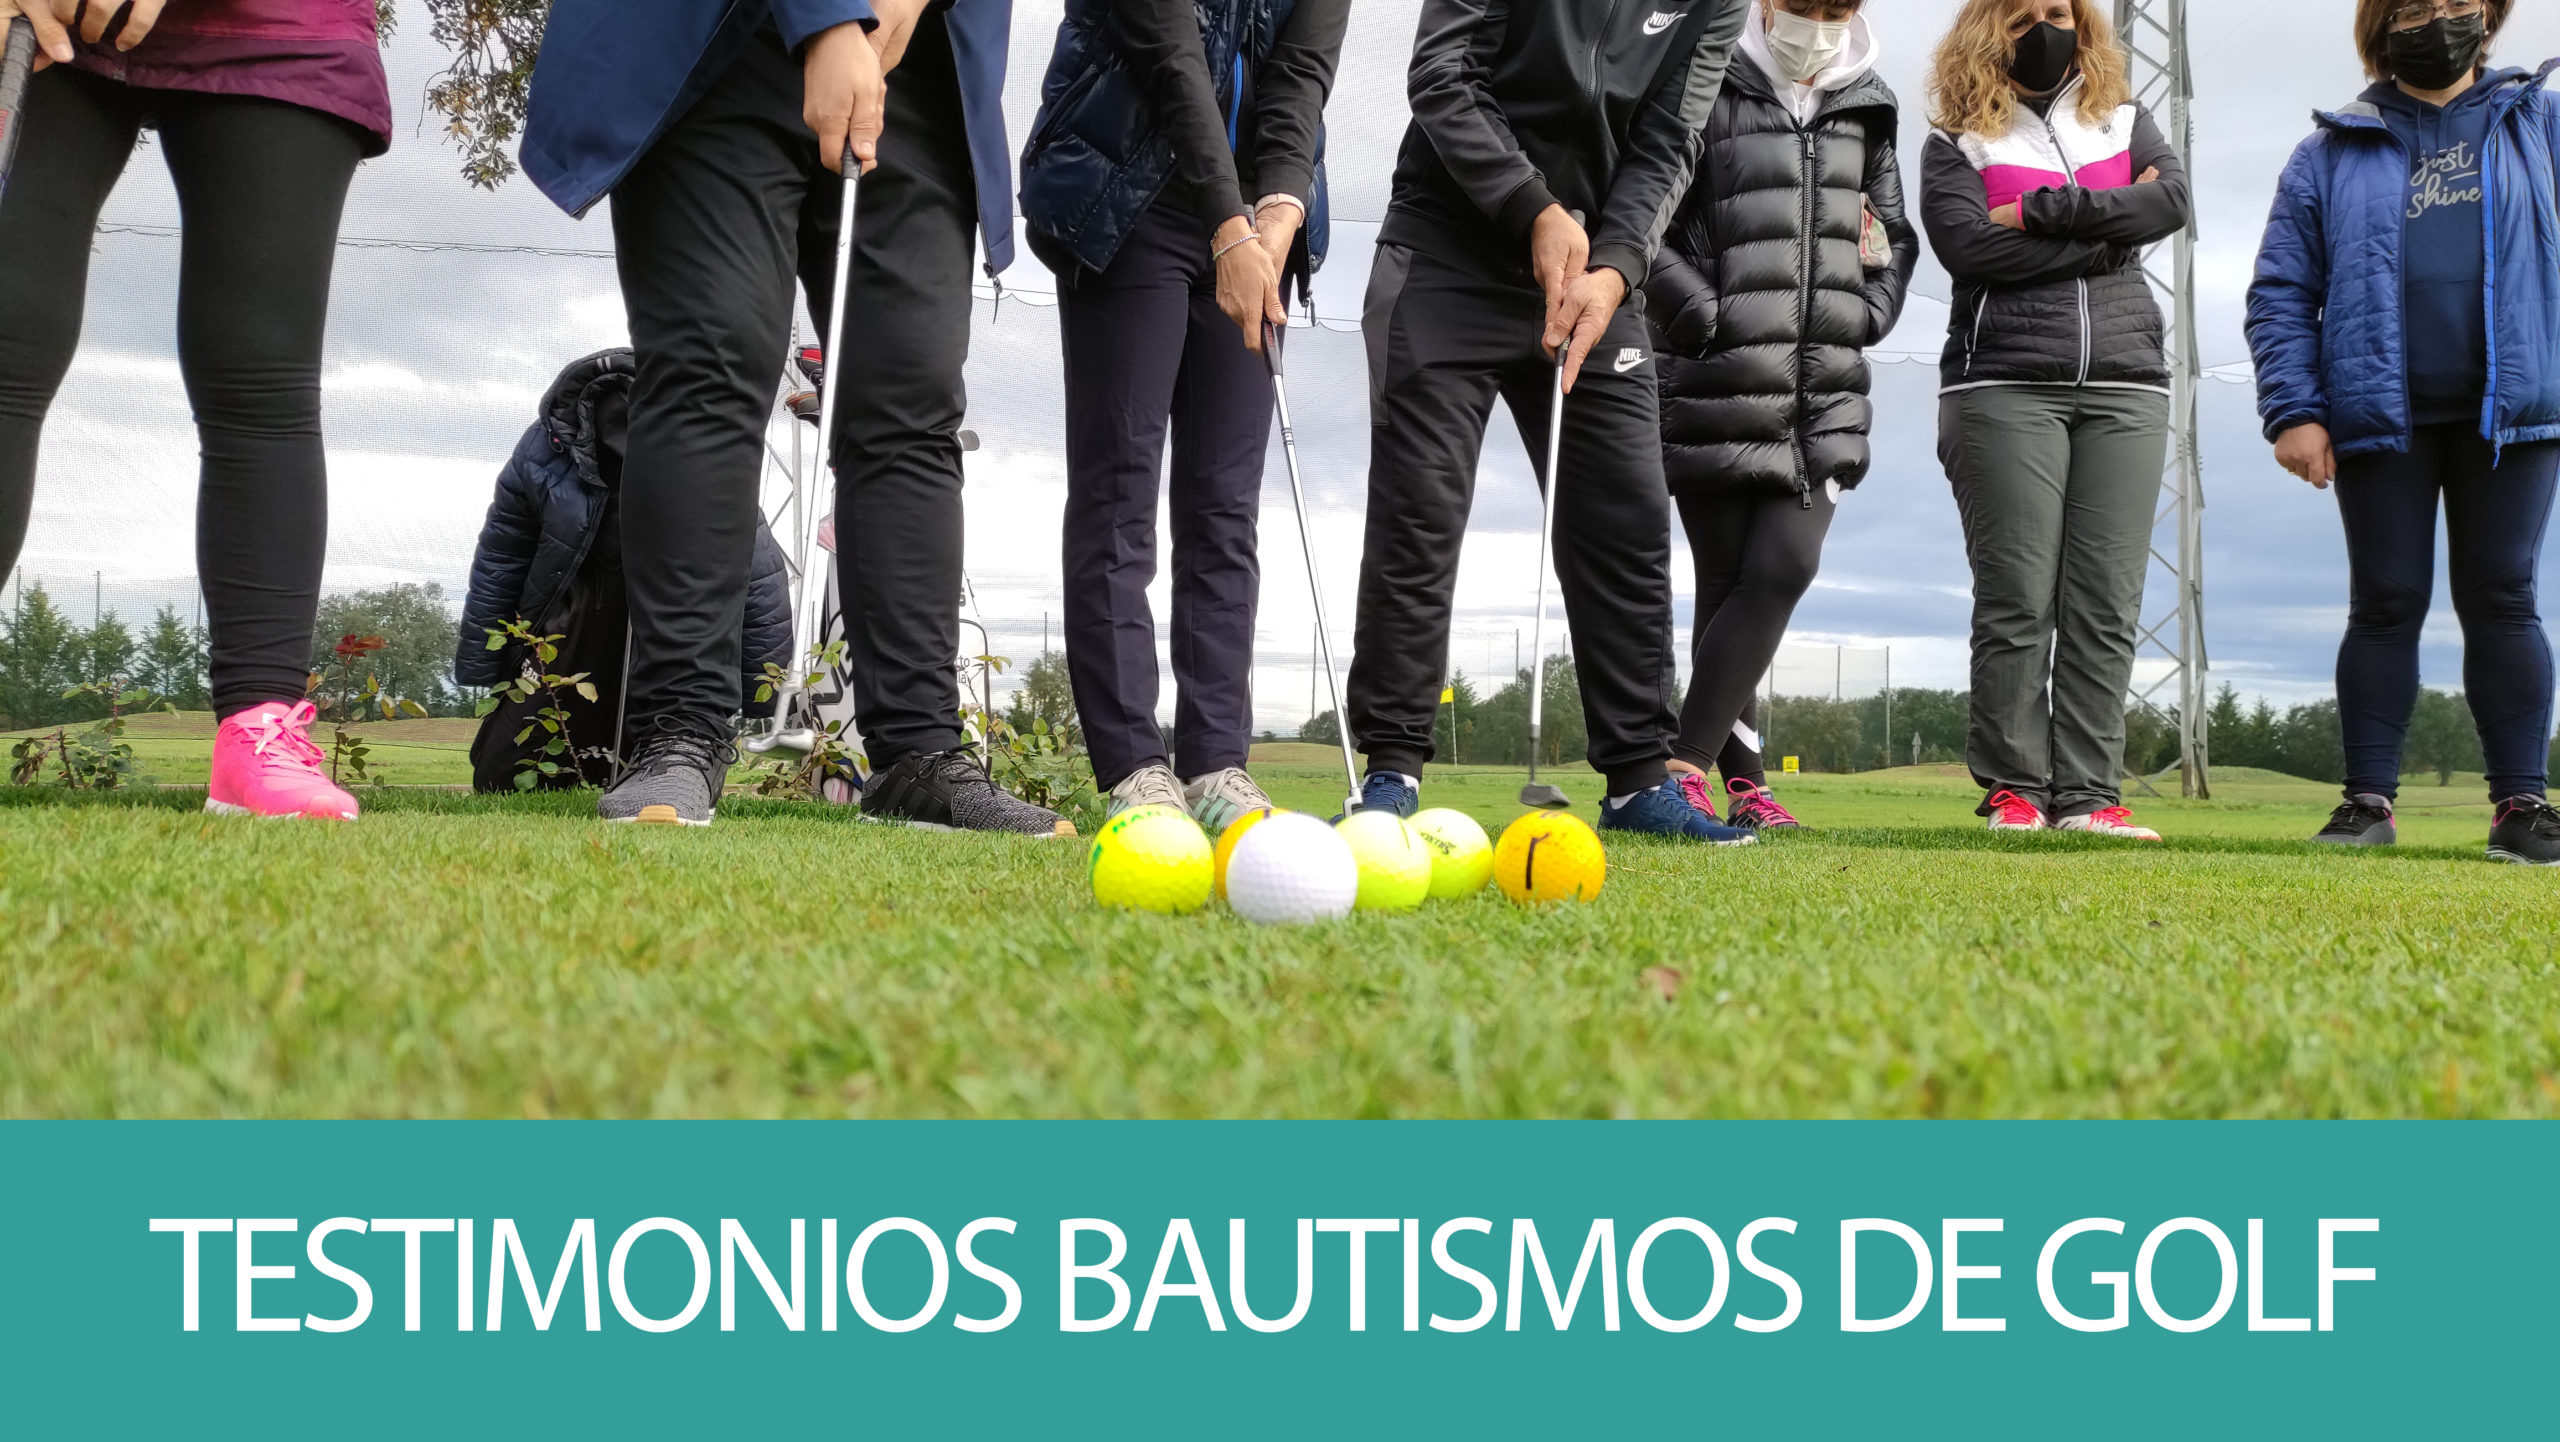 Testimonios bautismos de golf